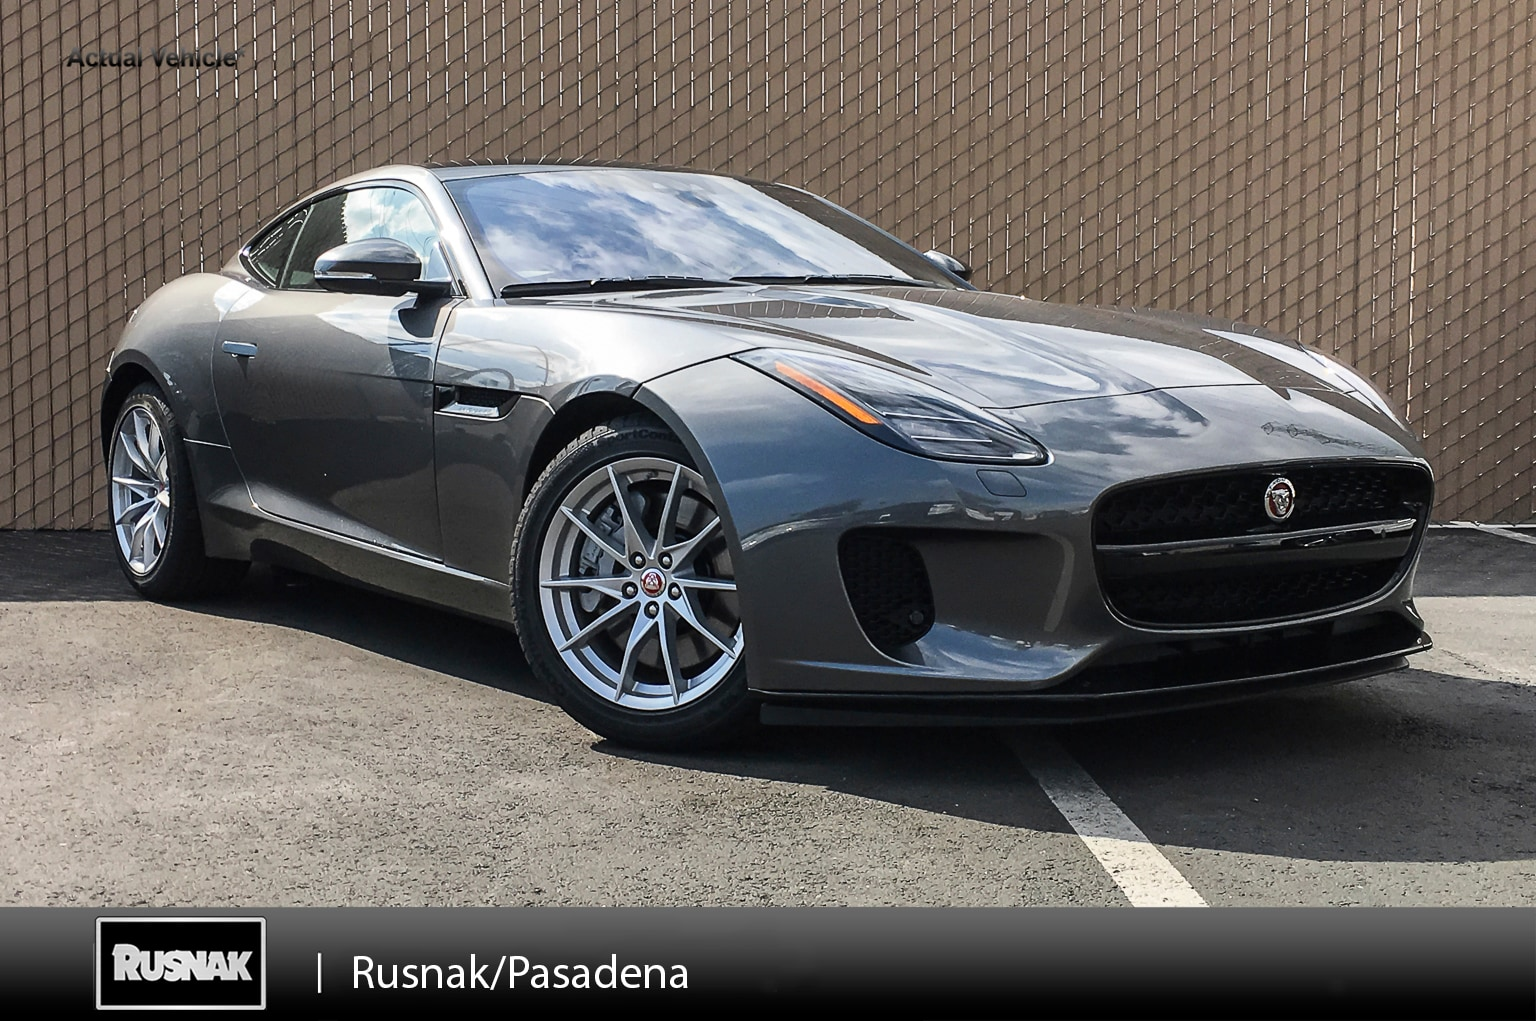 New 2019 Jaguar F-TYPE P300 Coupe For Sale Los Angeles California